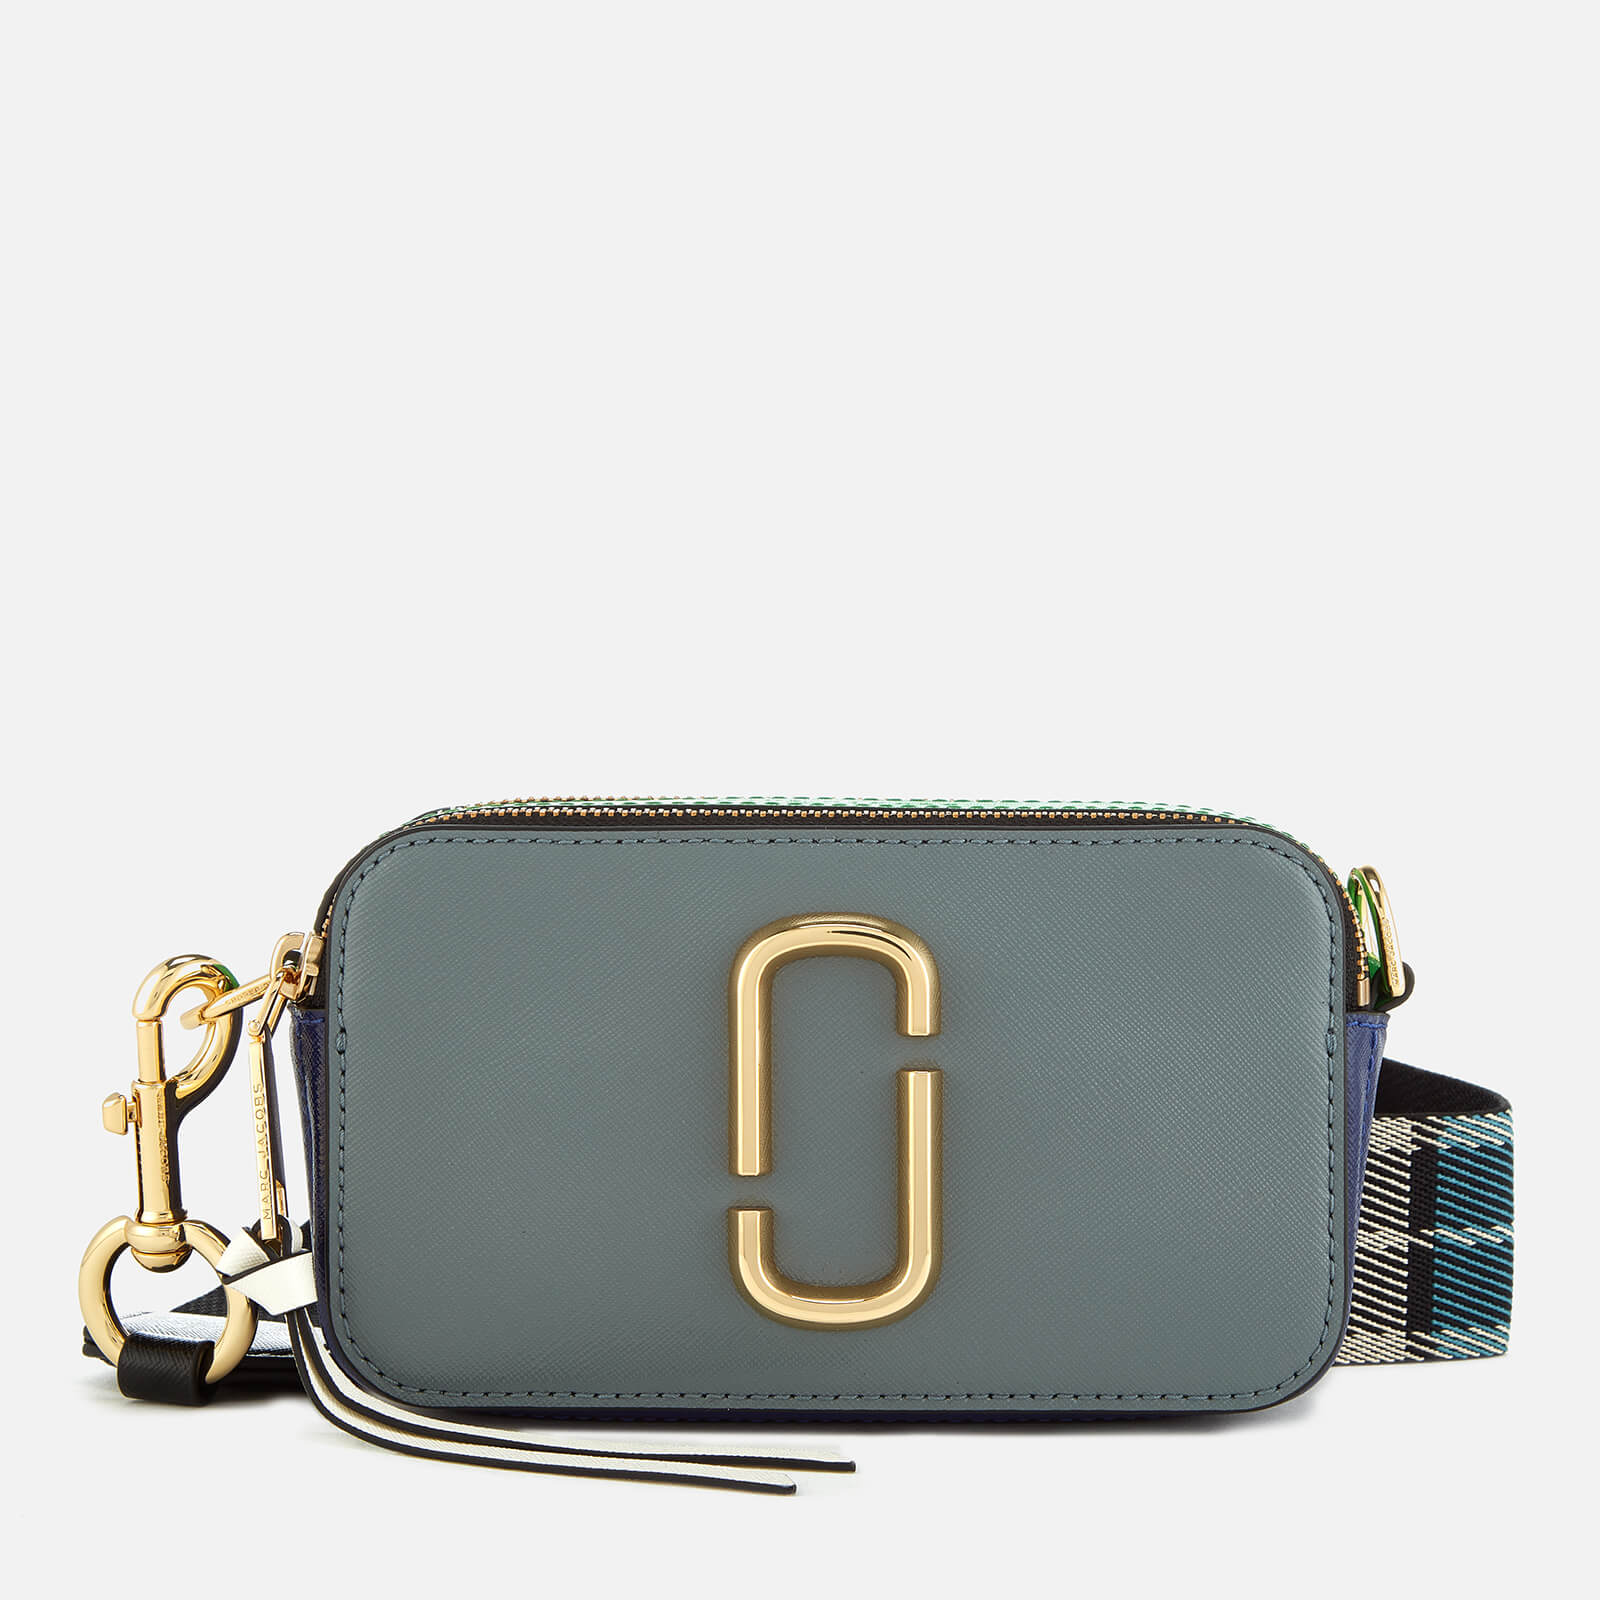 5e3956a80e8c Marc Jacobs Women s Snapshot Cross Body Bag - Slate - Free UK Delivery over  £50